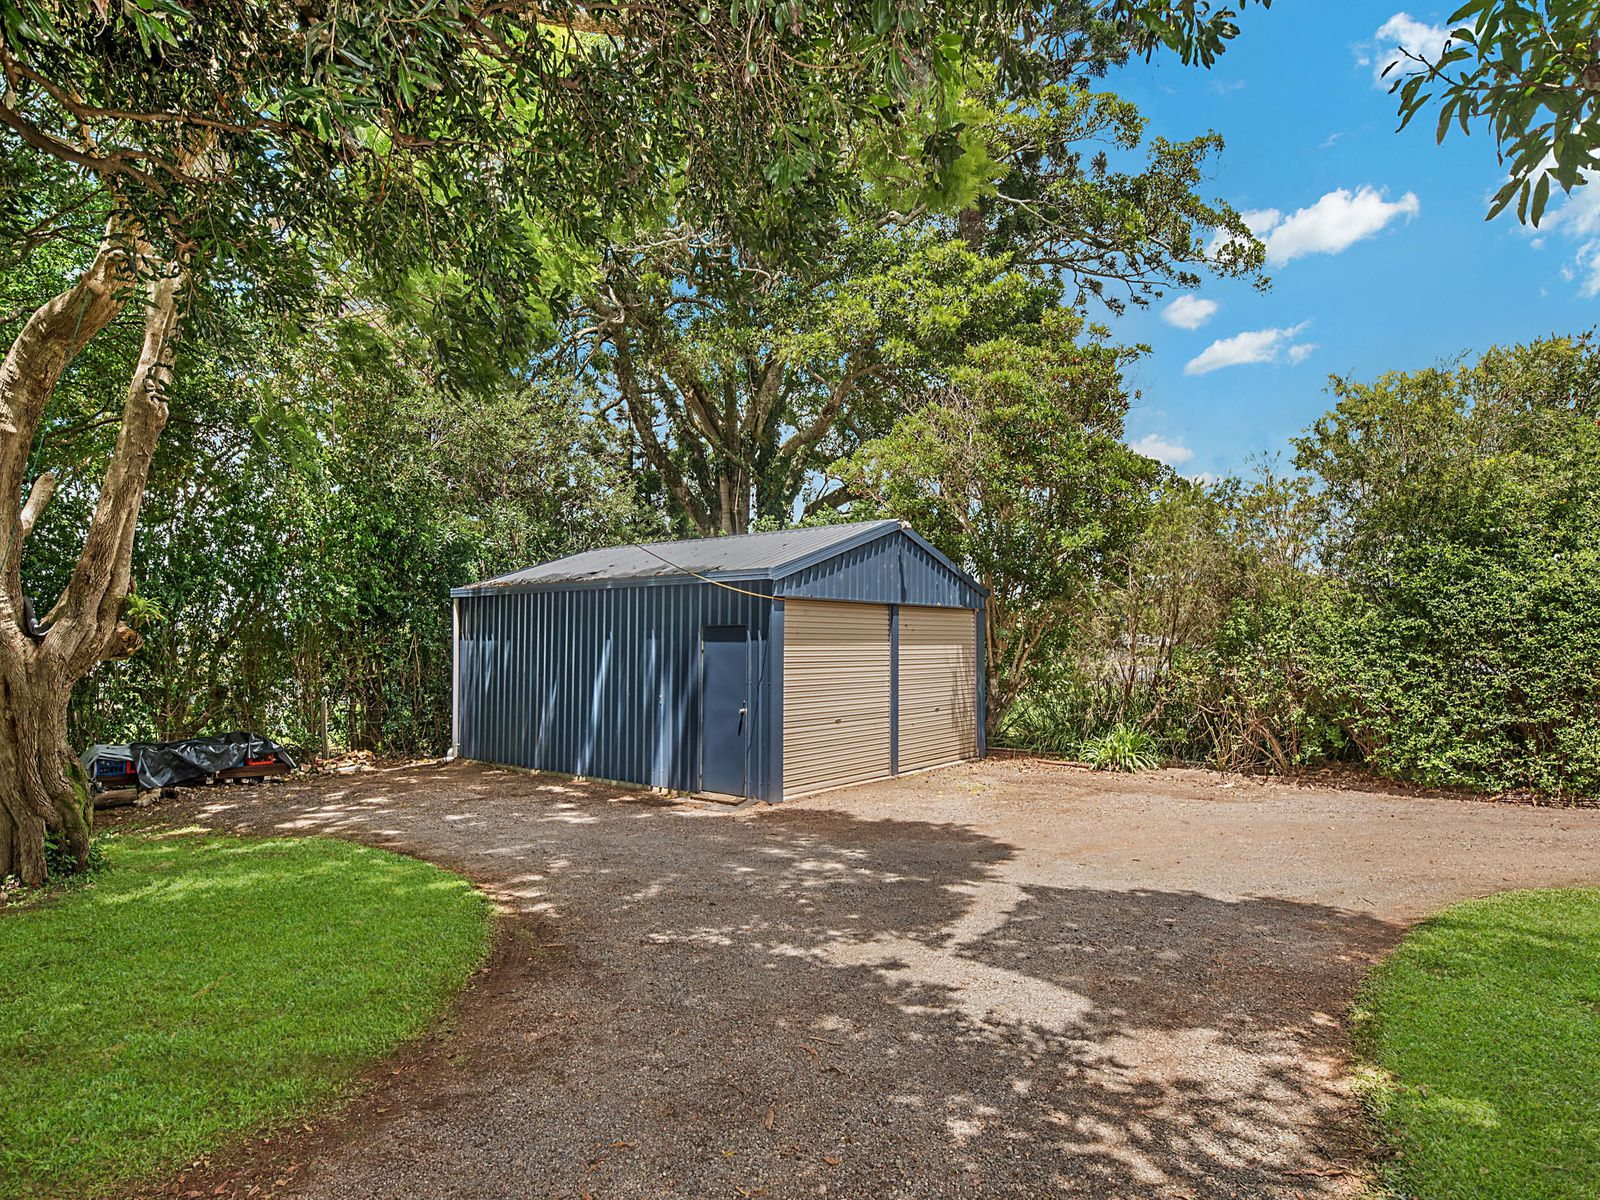 815 Landsborough Maleny Road, Bald Knob, QLD 4552